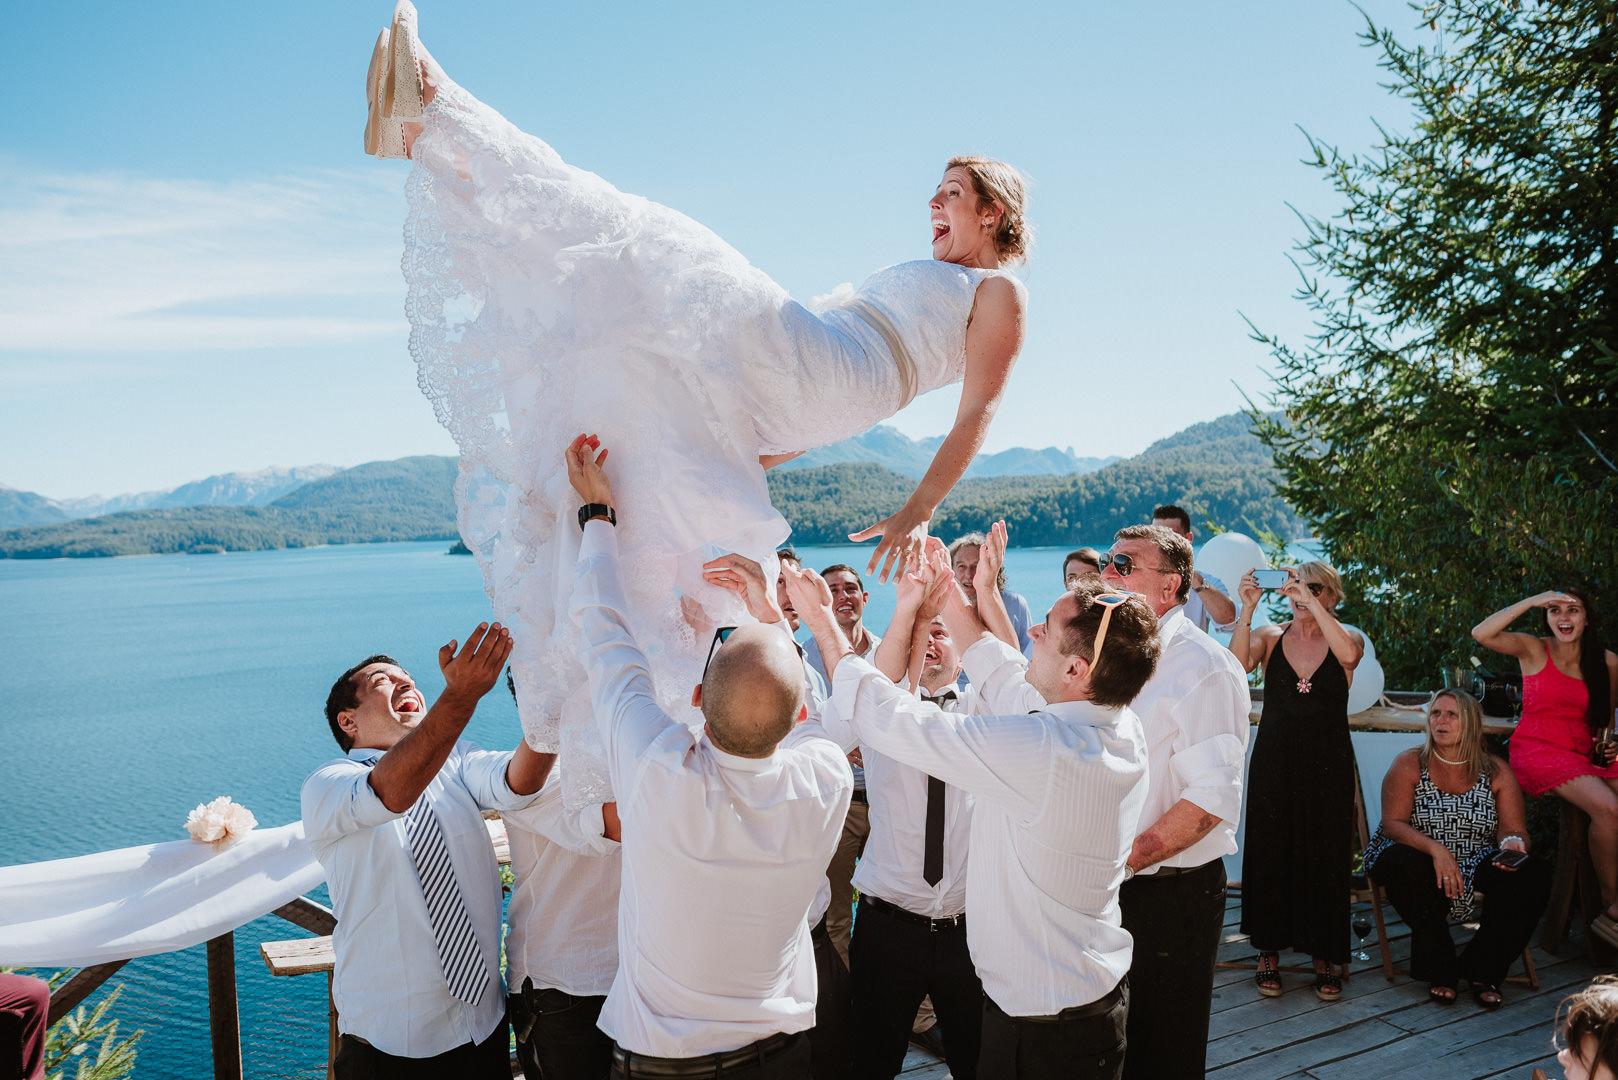 fotógrafo de casamiento en neuquen